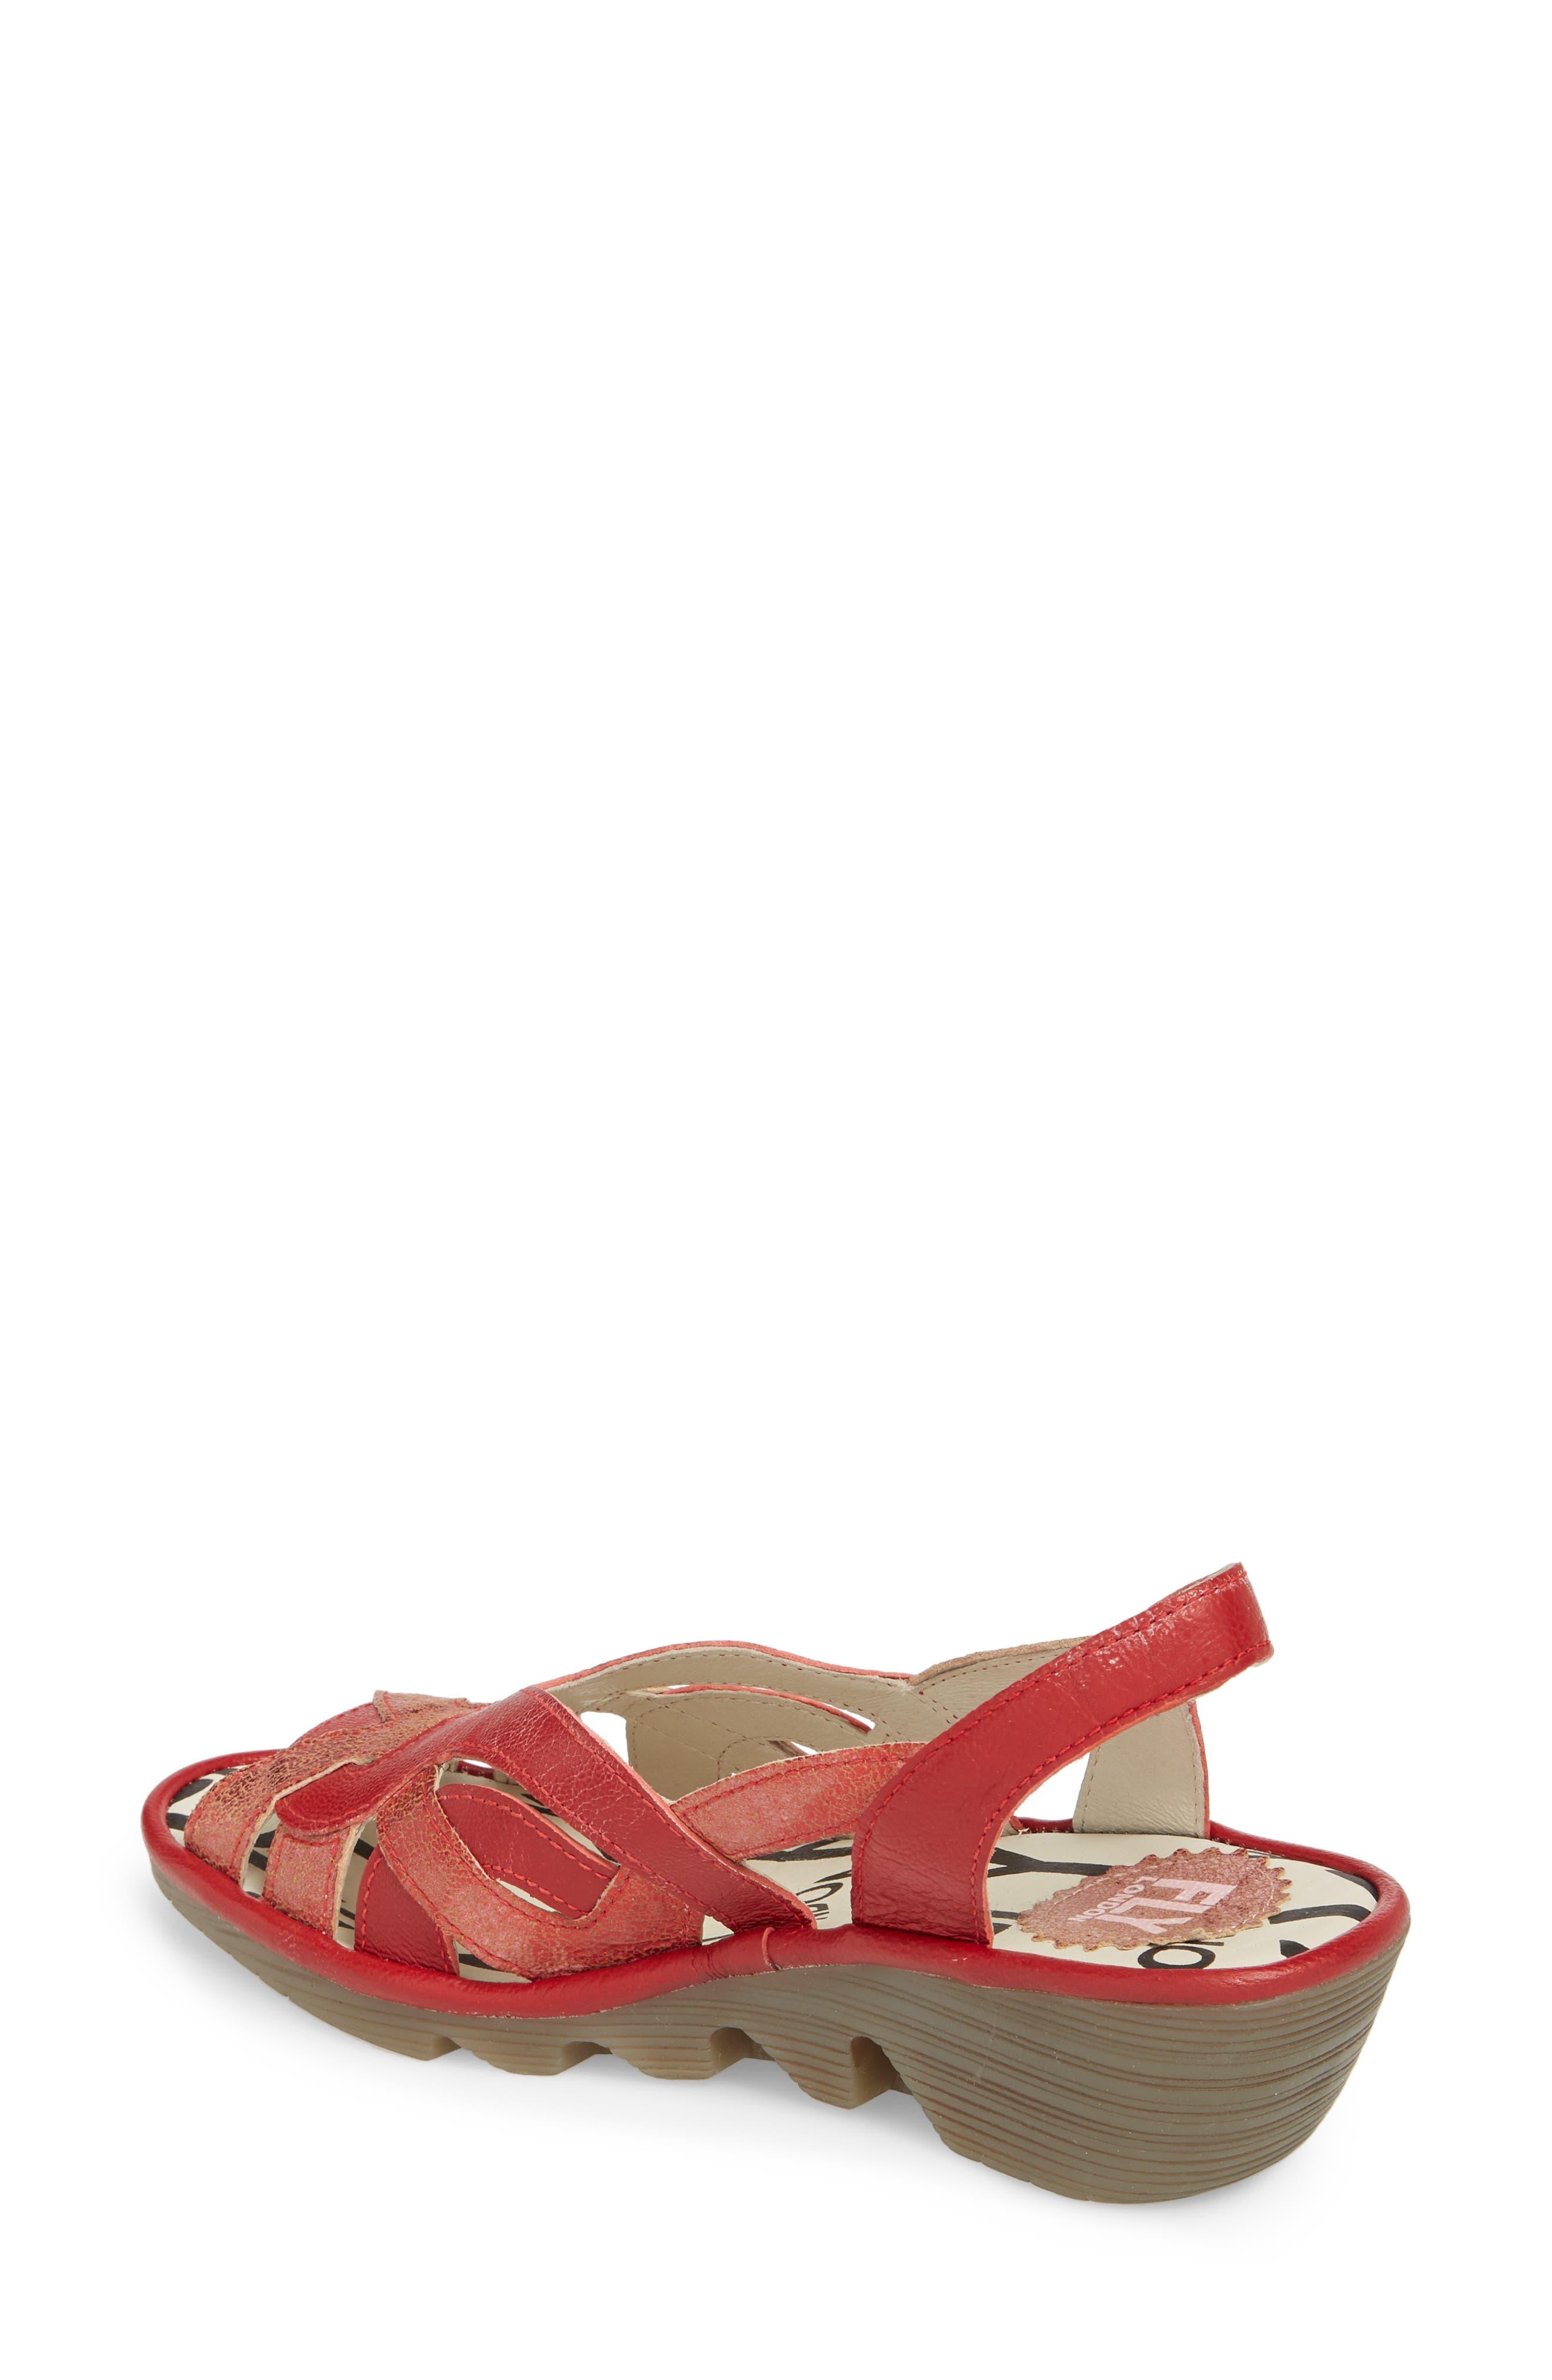 Pima Sandal,                             Alternate thumbnail 2, color,                             Red Mix Leather